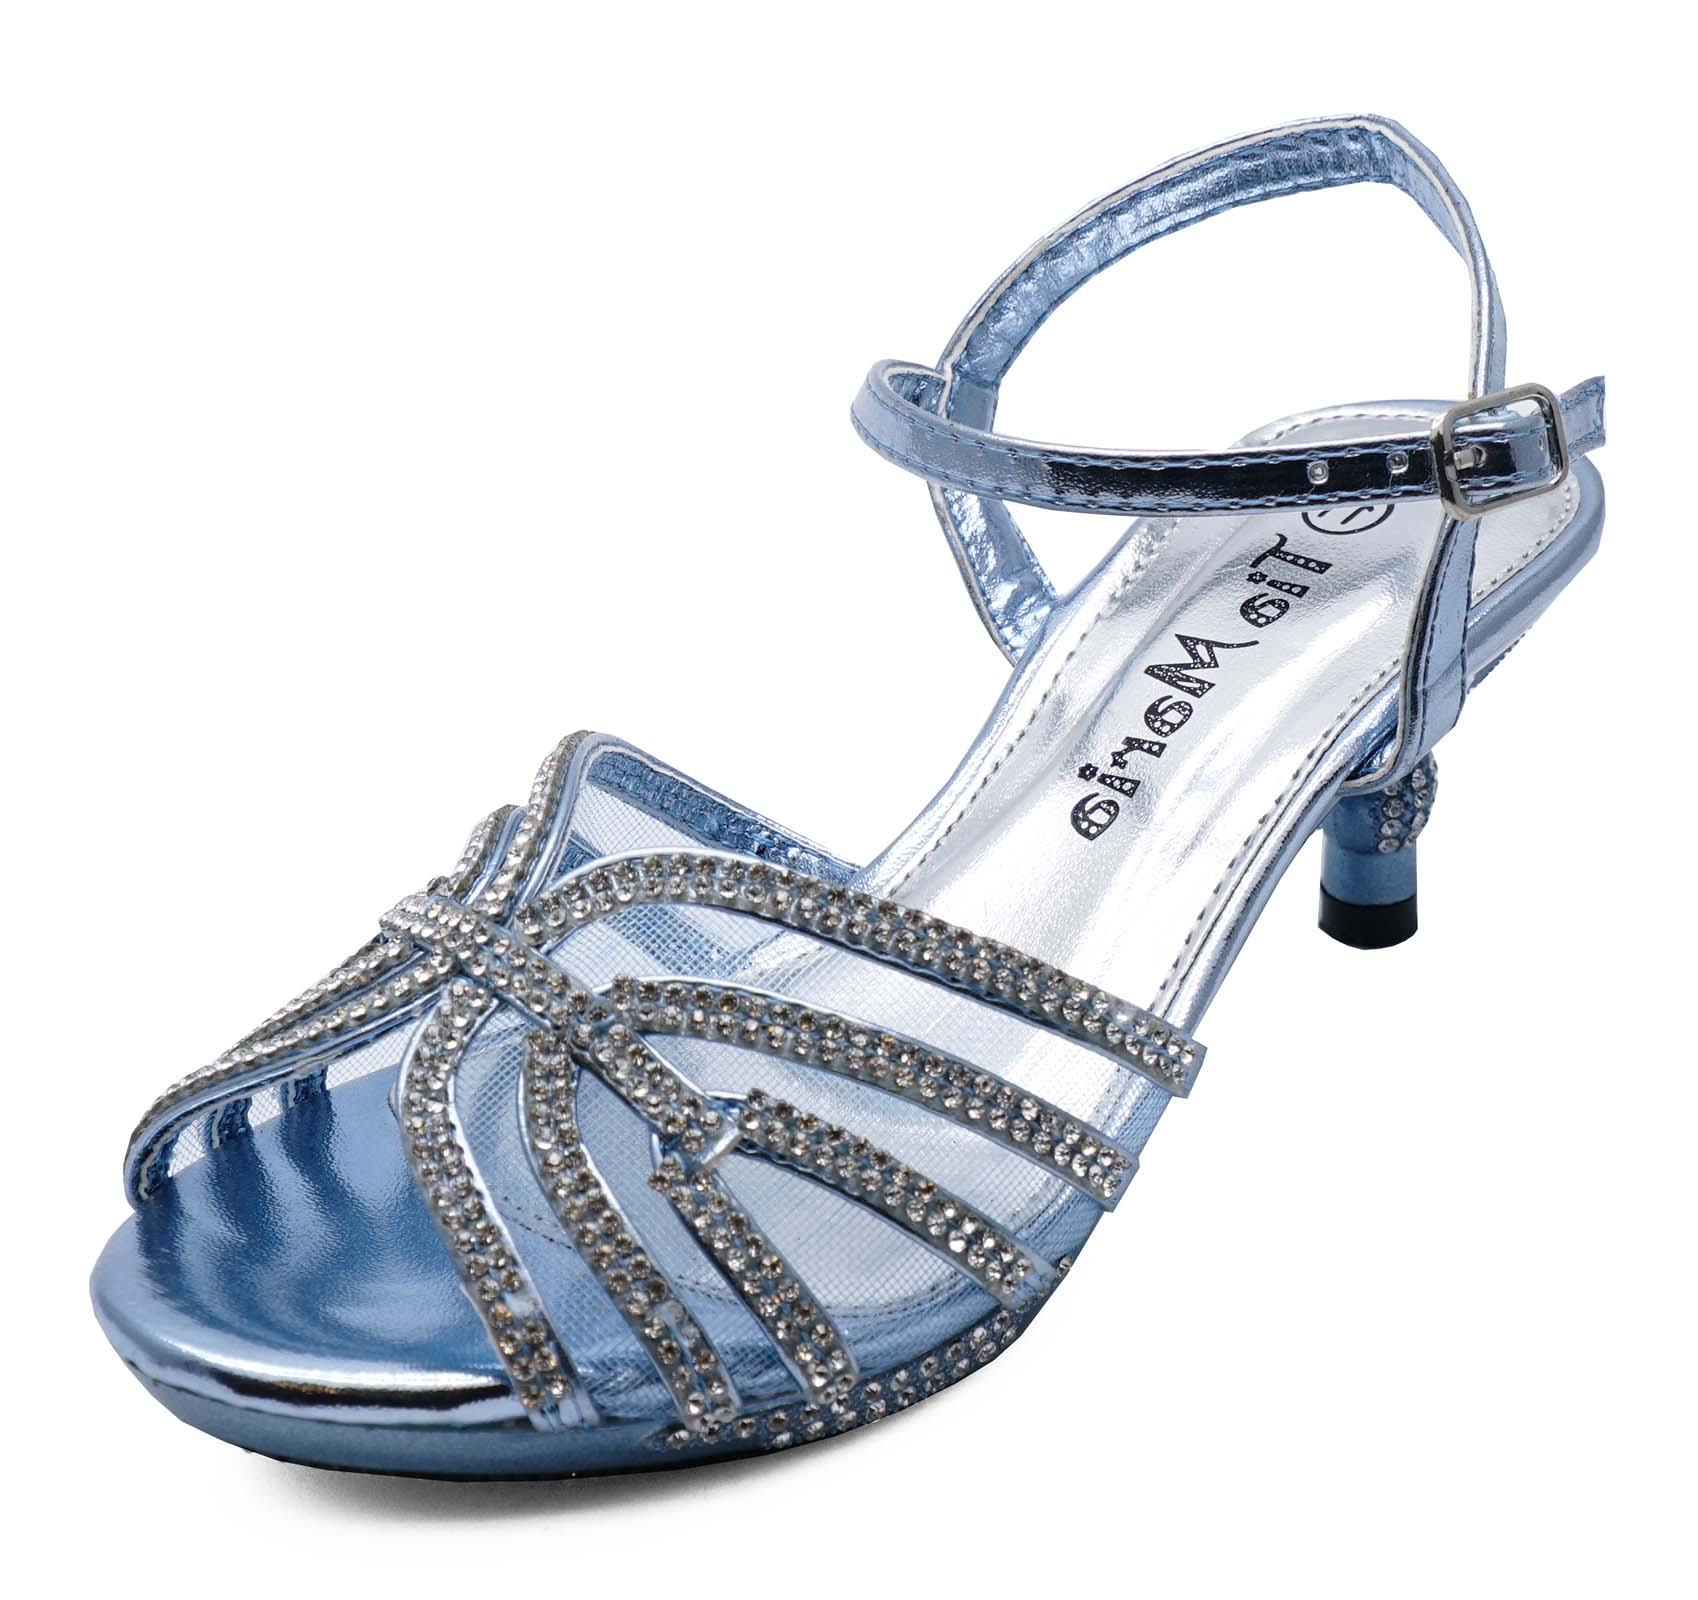 c6ba69446 Sentinel GIRLS KIDS BLUE DIAMANTE LOW-HEEL SANDALS PRETTY PARTY DRESS SHOES  UK 10-2